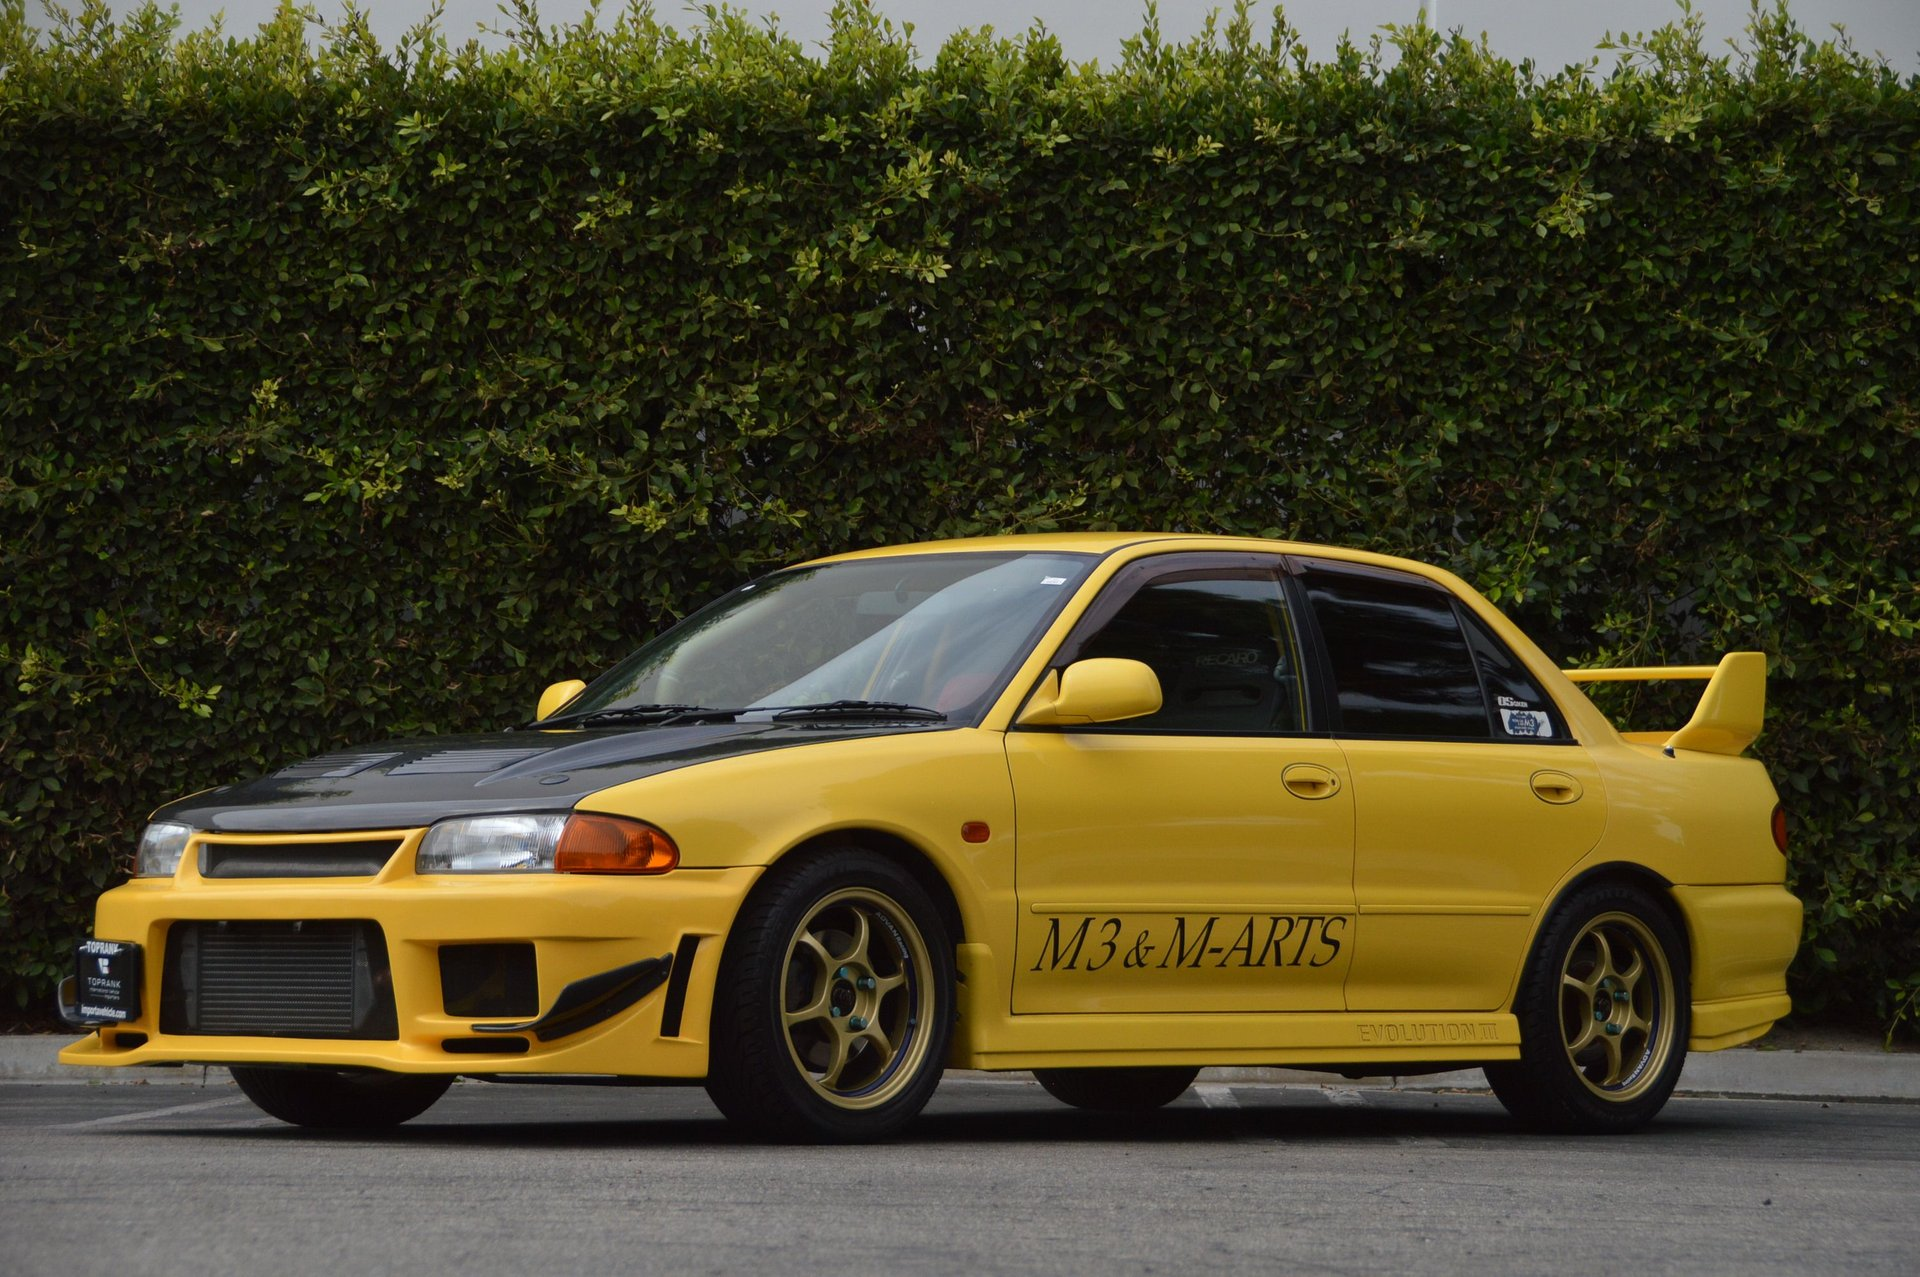 1995 Mitsubishi Lancer Evolution